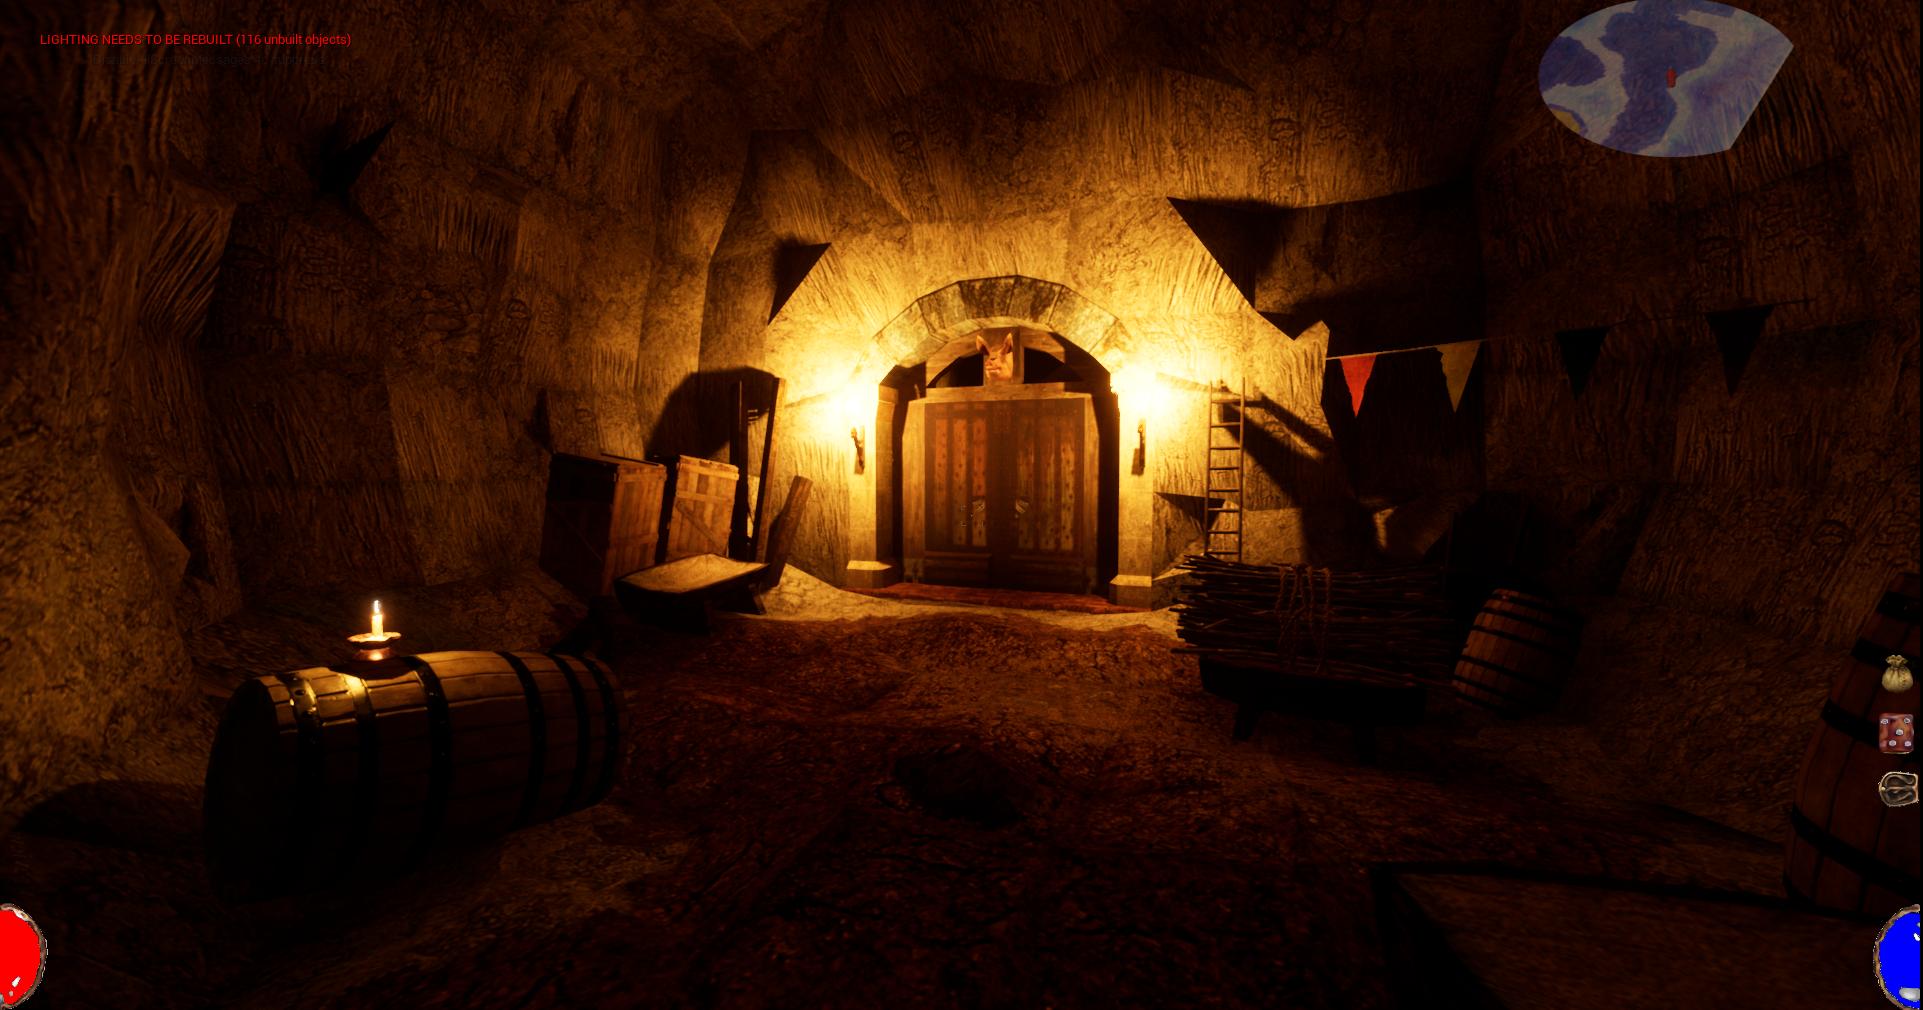 Arx Fatalis Unreal Engine 4 Remastered